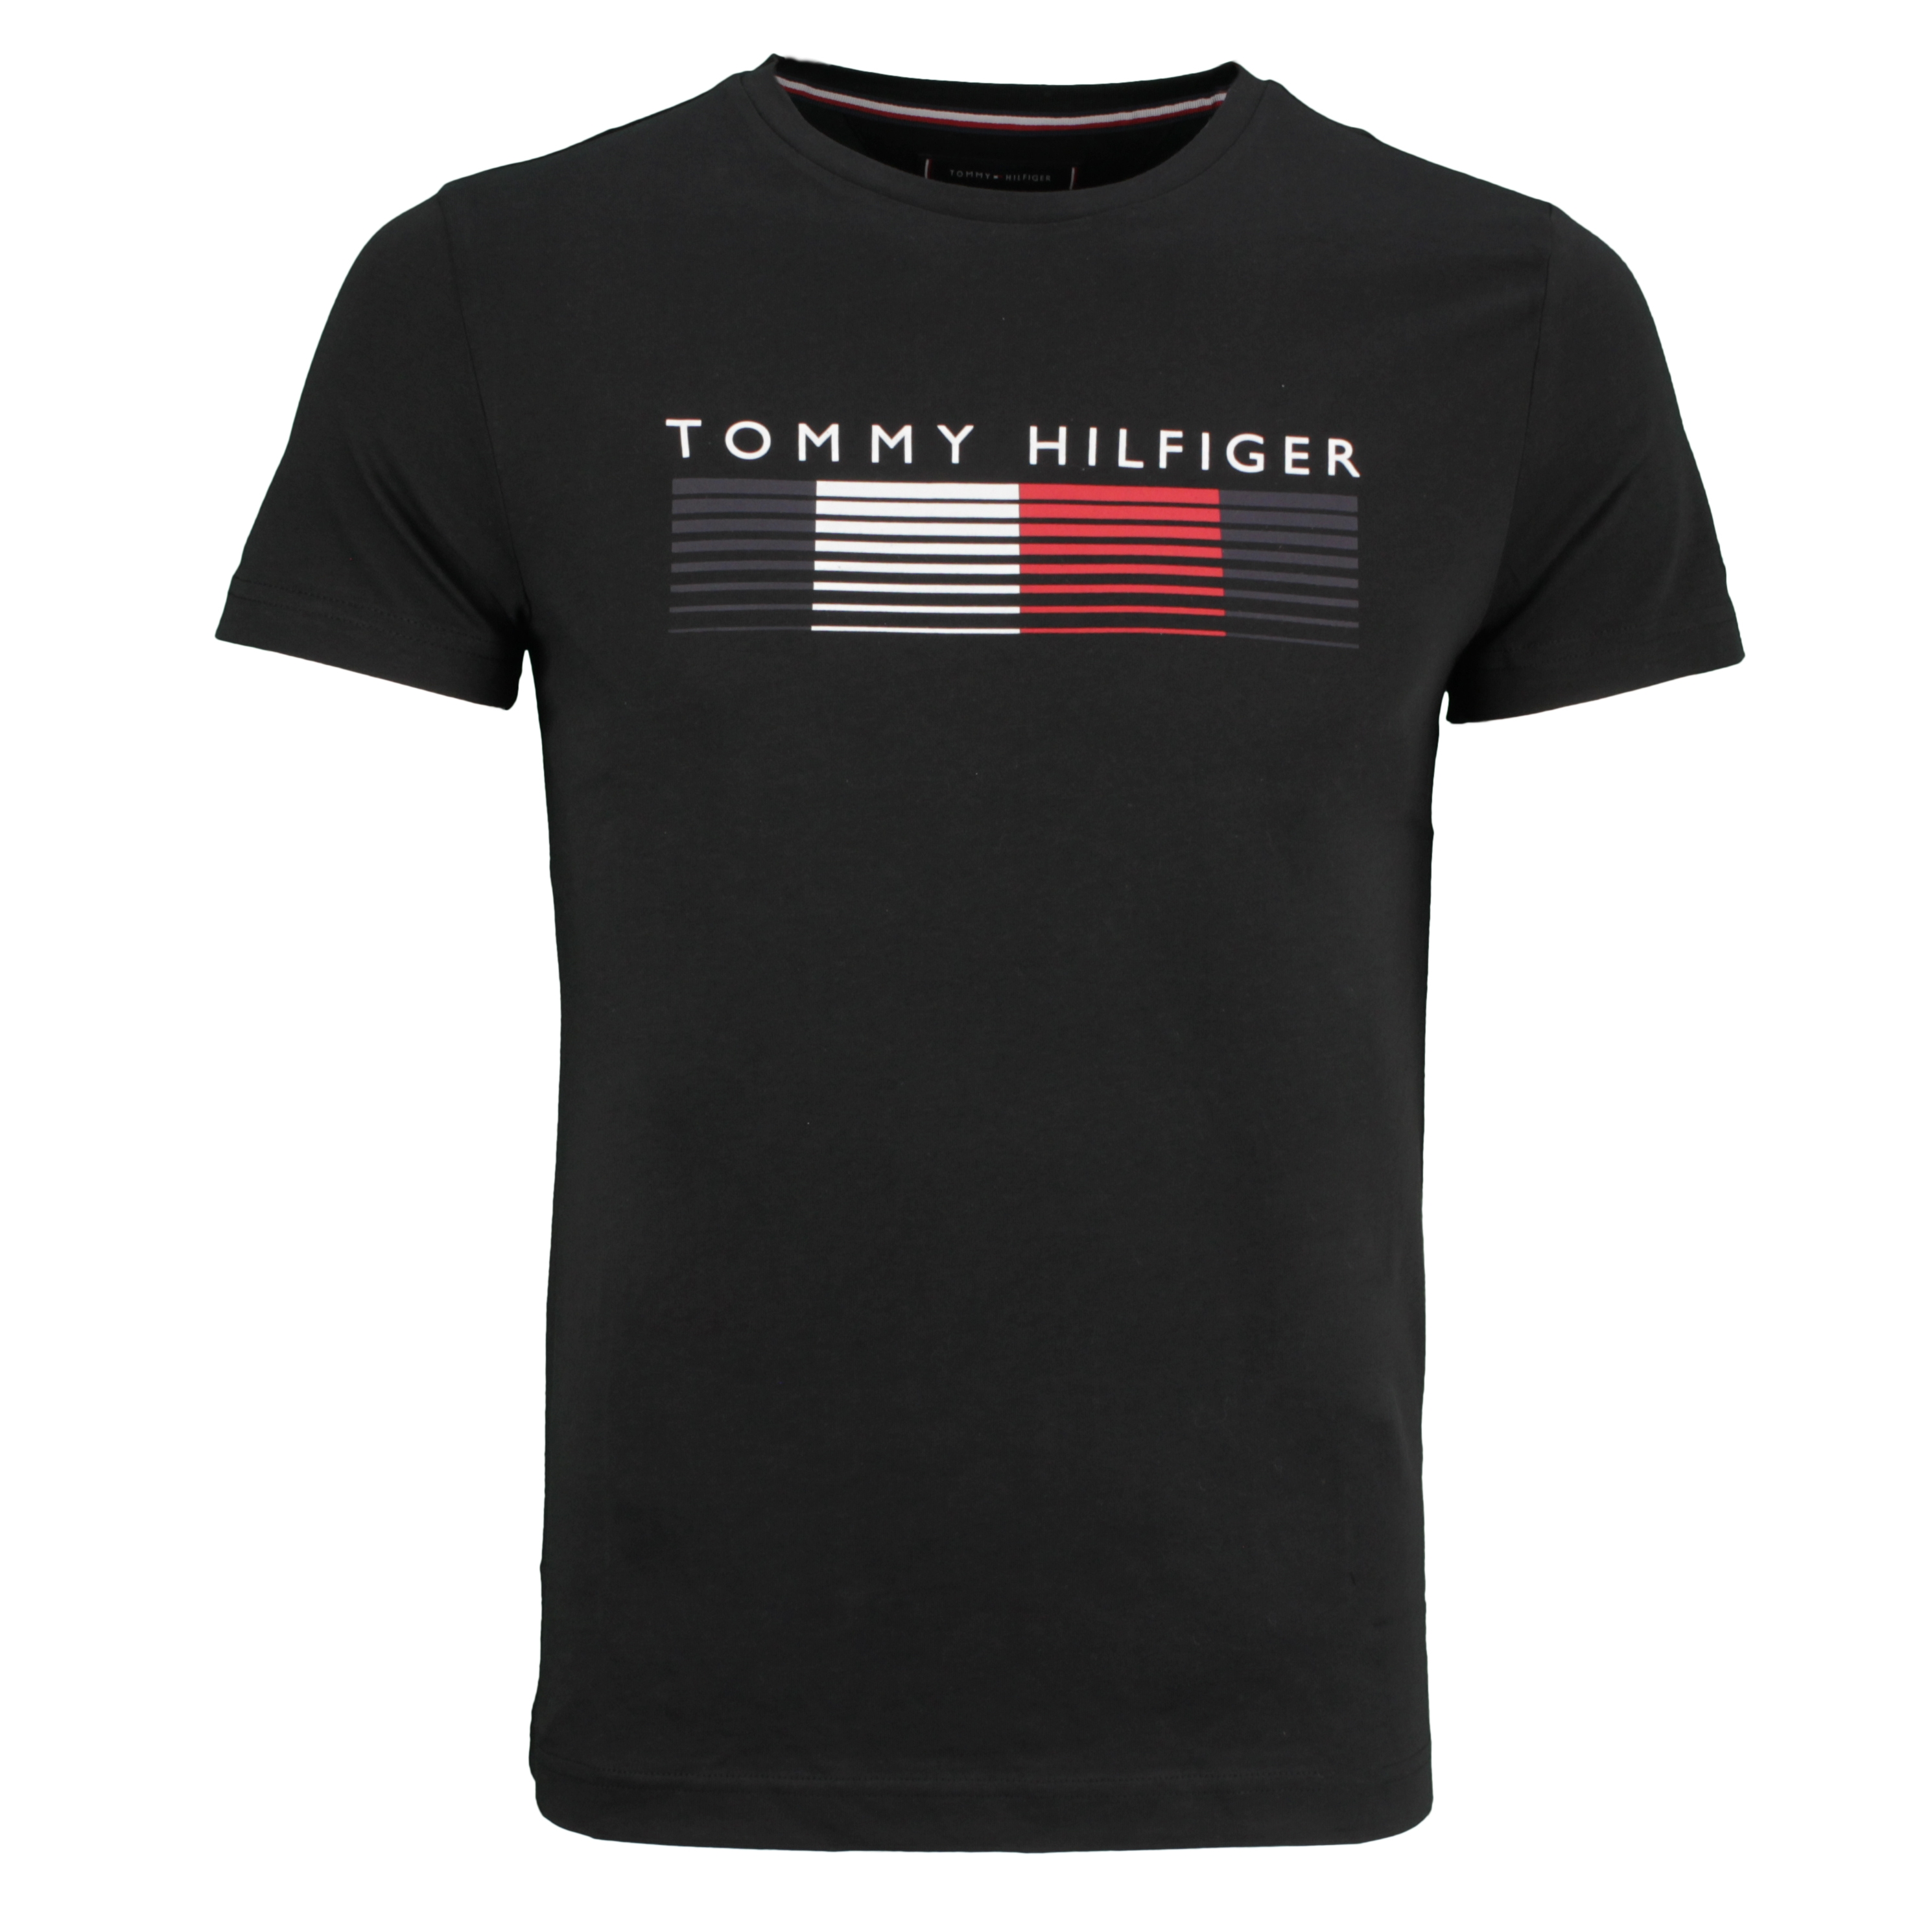 Tommy Hilfiger T-Shirt Shirt kurzarm Fade Graphic Corp Tee schwarz MW0MW21008 BDS-BLACK